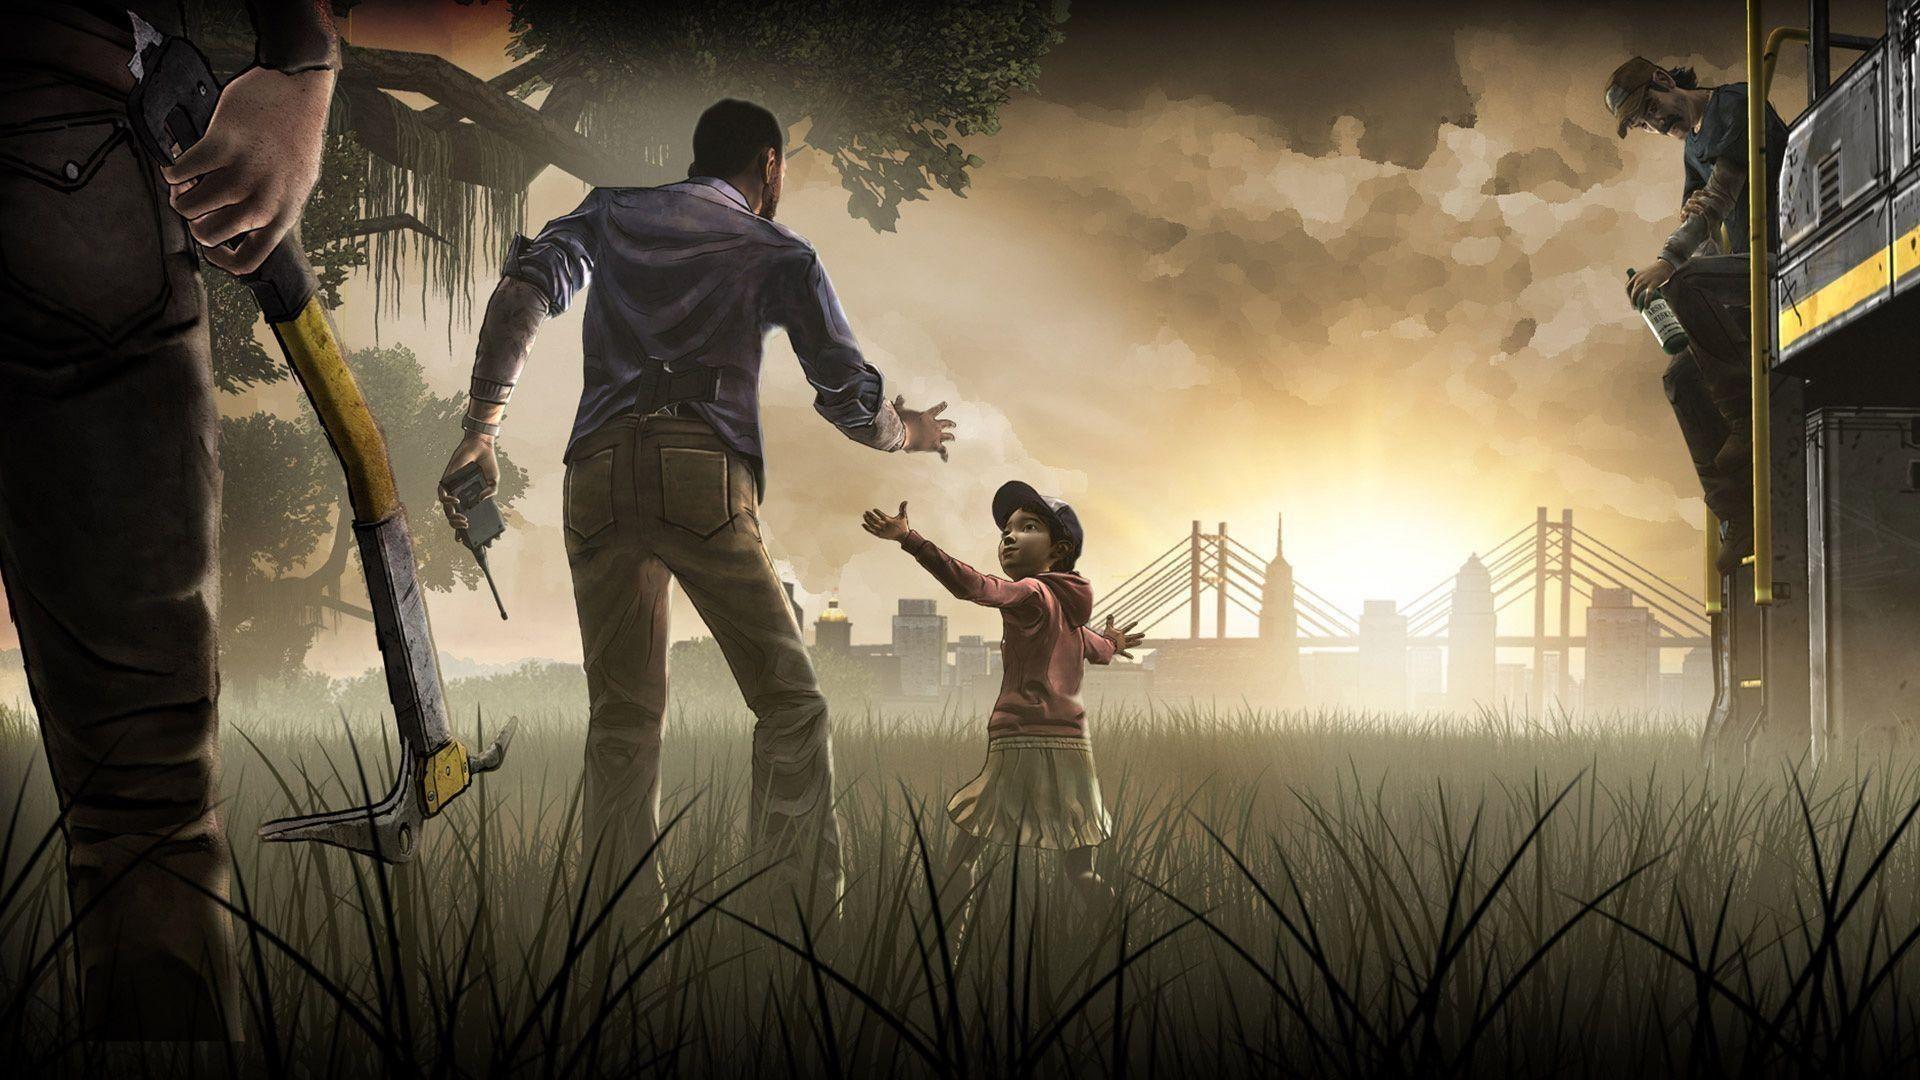 10 Latest Walking Dead Game Wallpaper Full Hd 1080p For Pc Desktop Walking Dead Game The Walking Dead Walking Dead Wallpaper